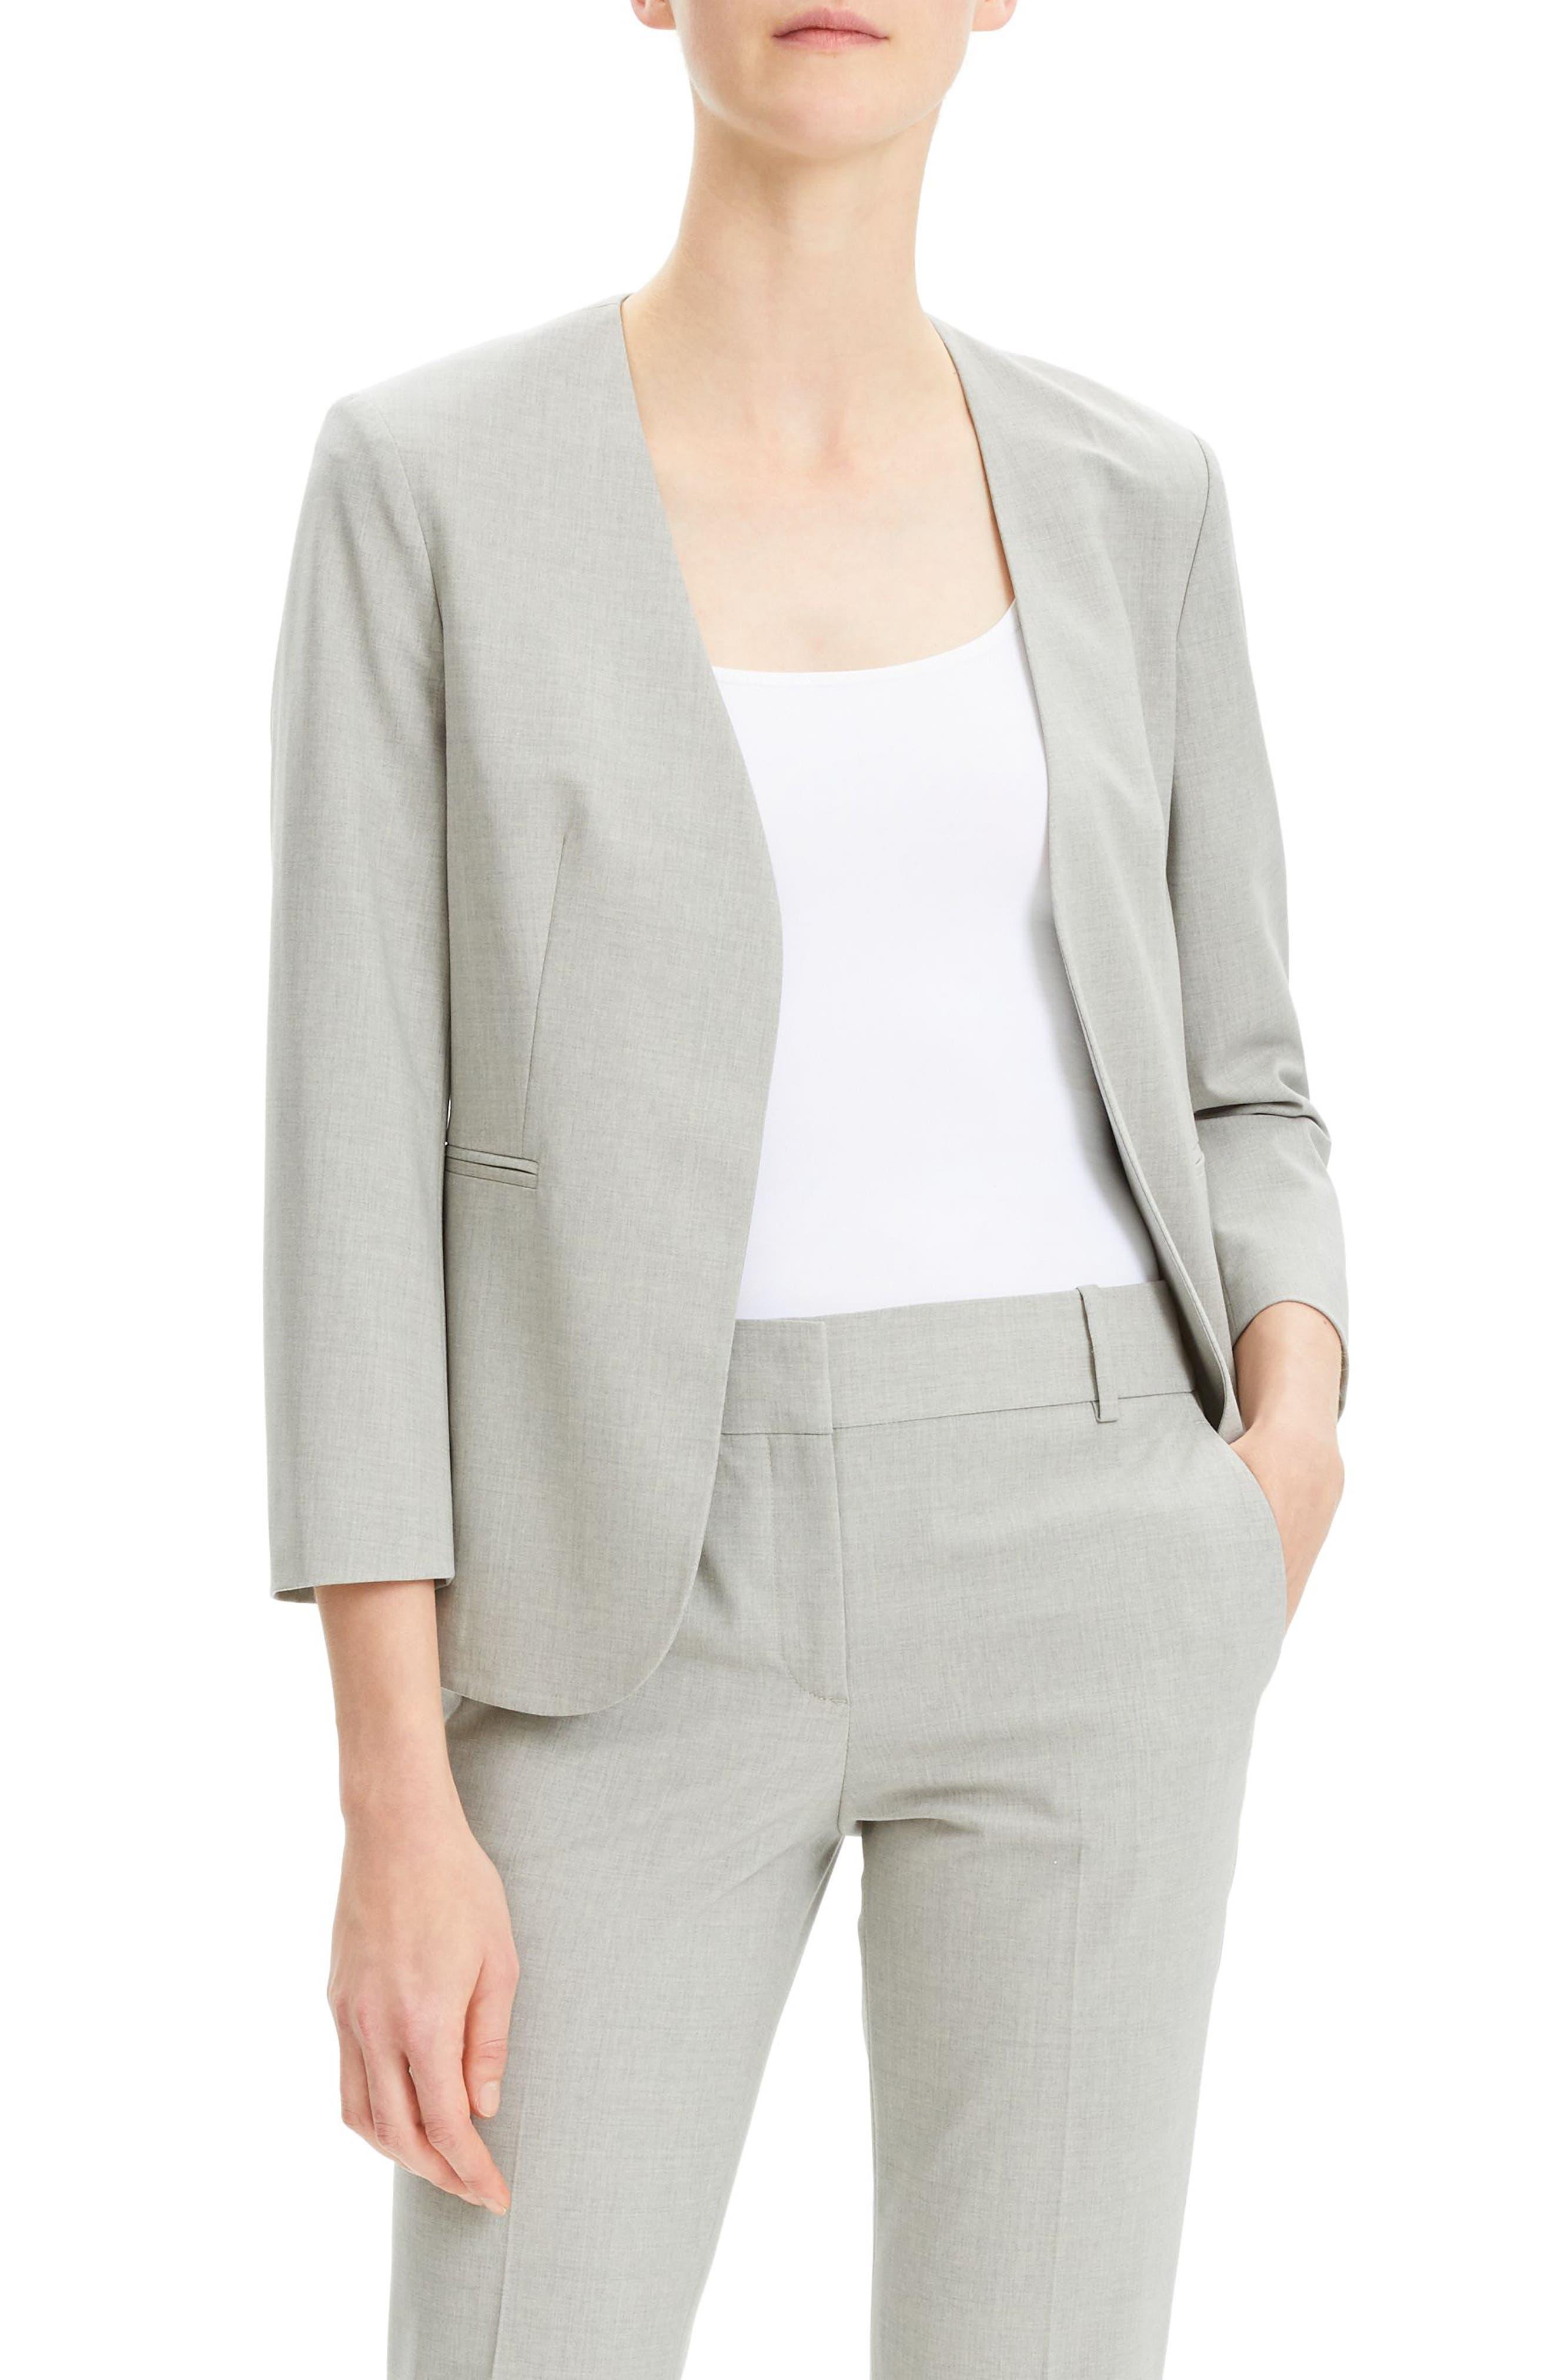 THEORY, Lindrayia B Good Wool Suit Jacket, Main thumbnail 1, color, LIGHT GREY MELANGE